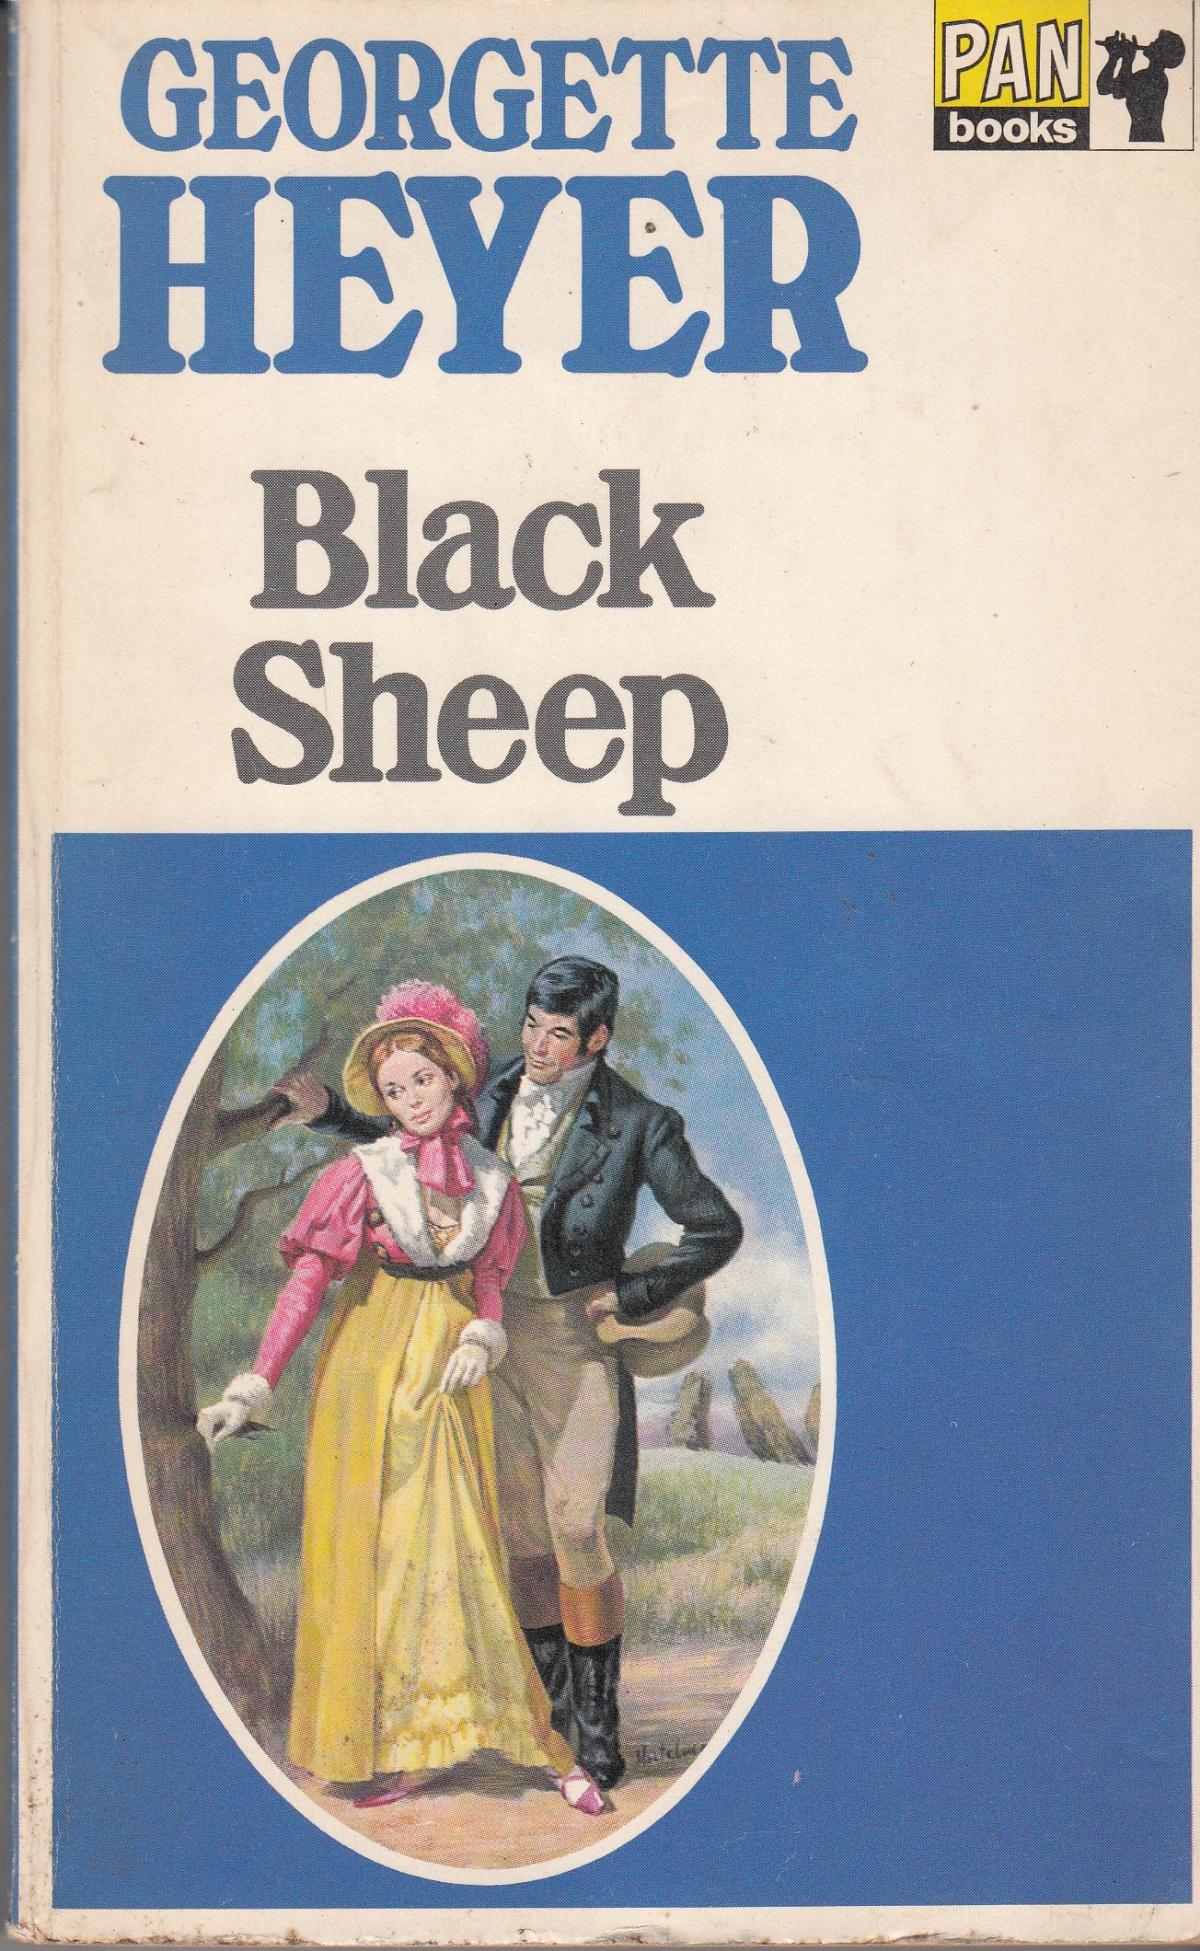 Black Sheep - Georgette Heyer - Pan Books - Acceptable - Paperback